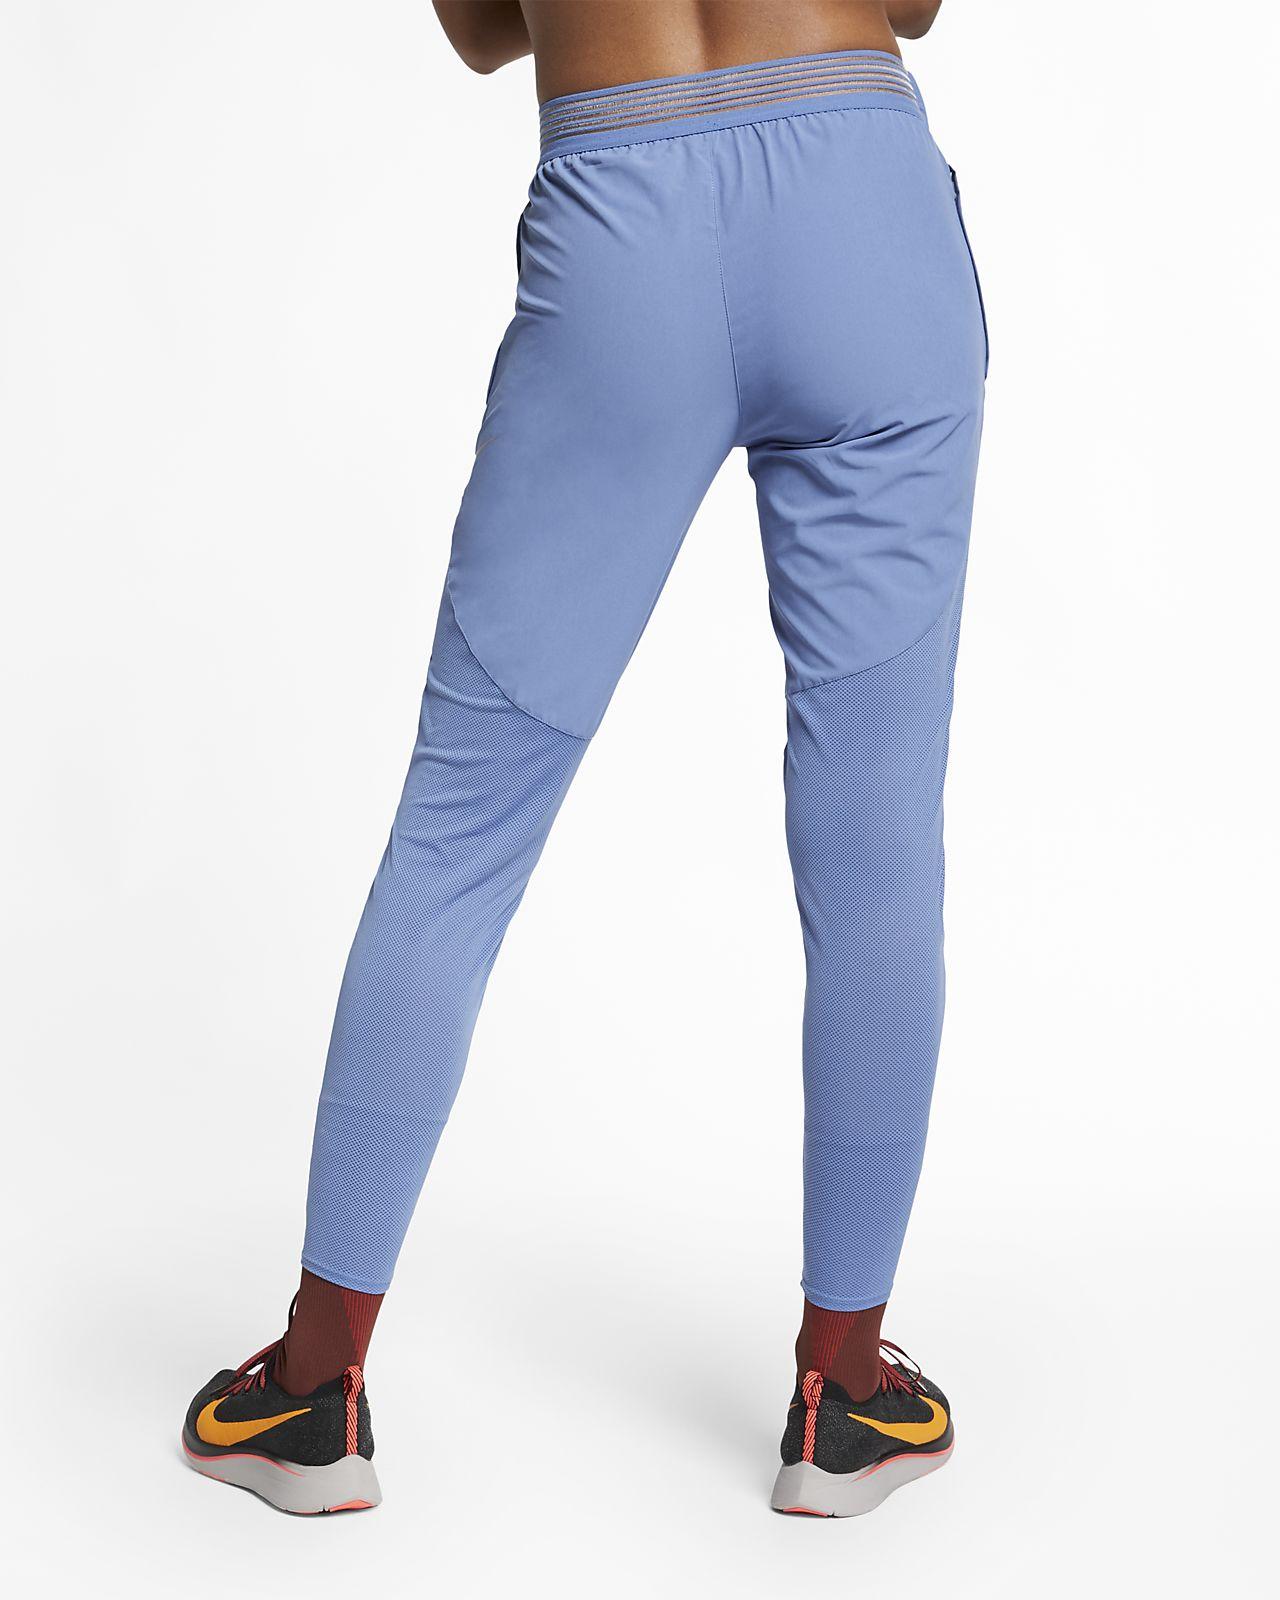 509776712c Low Resolution Nike Flex Essential női futónadrág Nike Flex Essential női  futónadrág